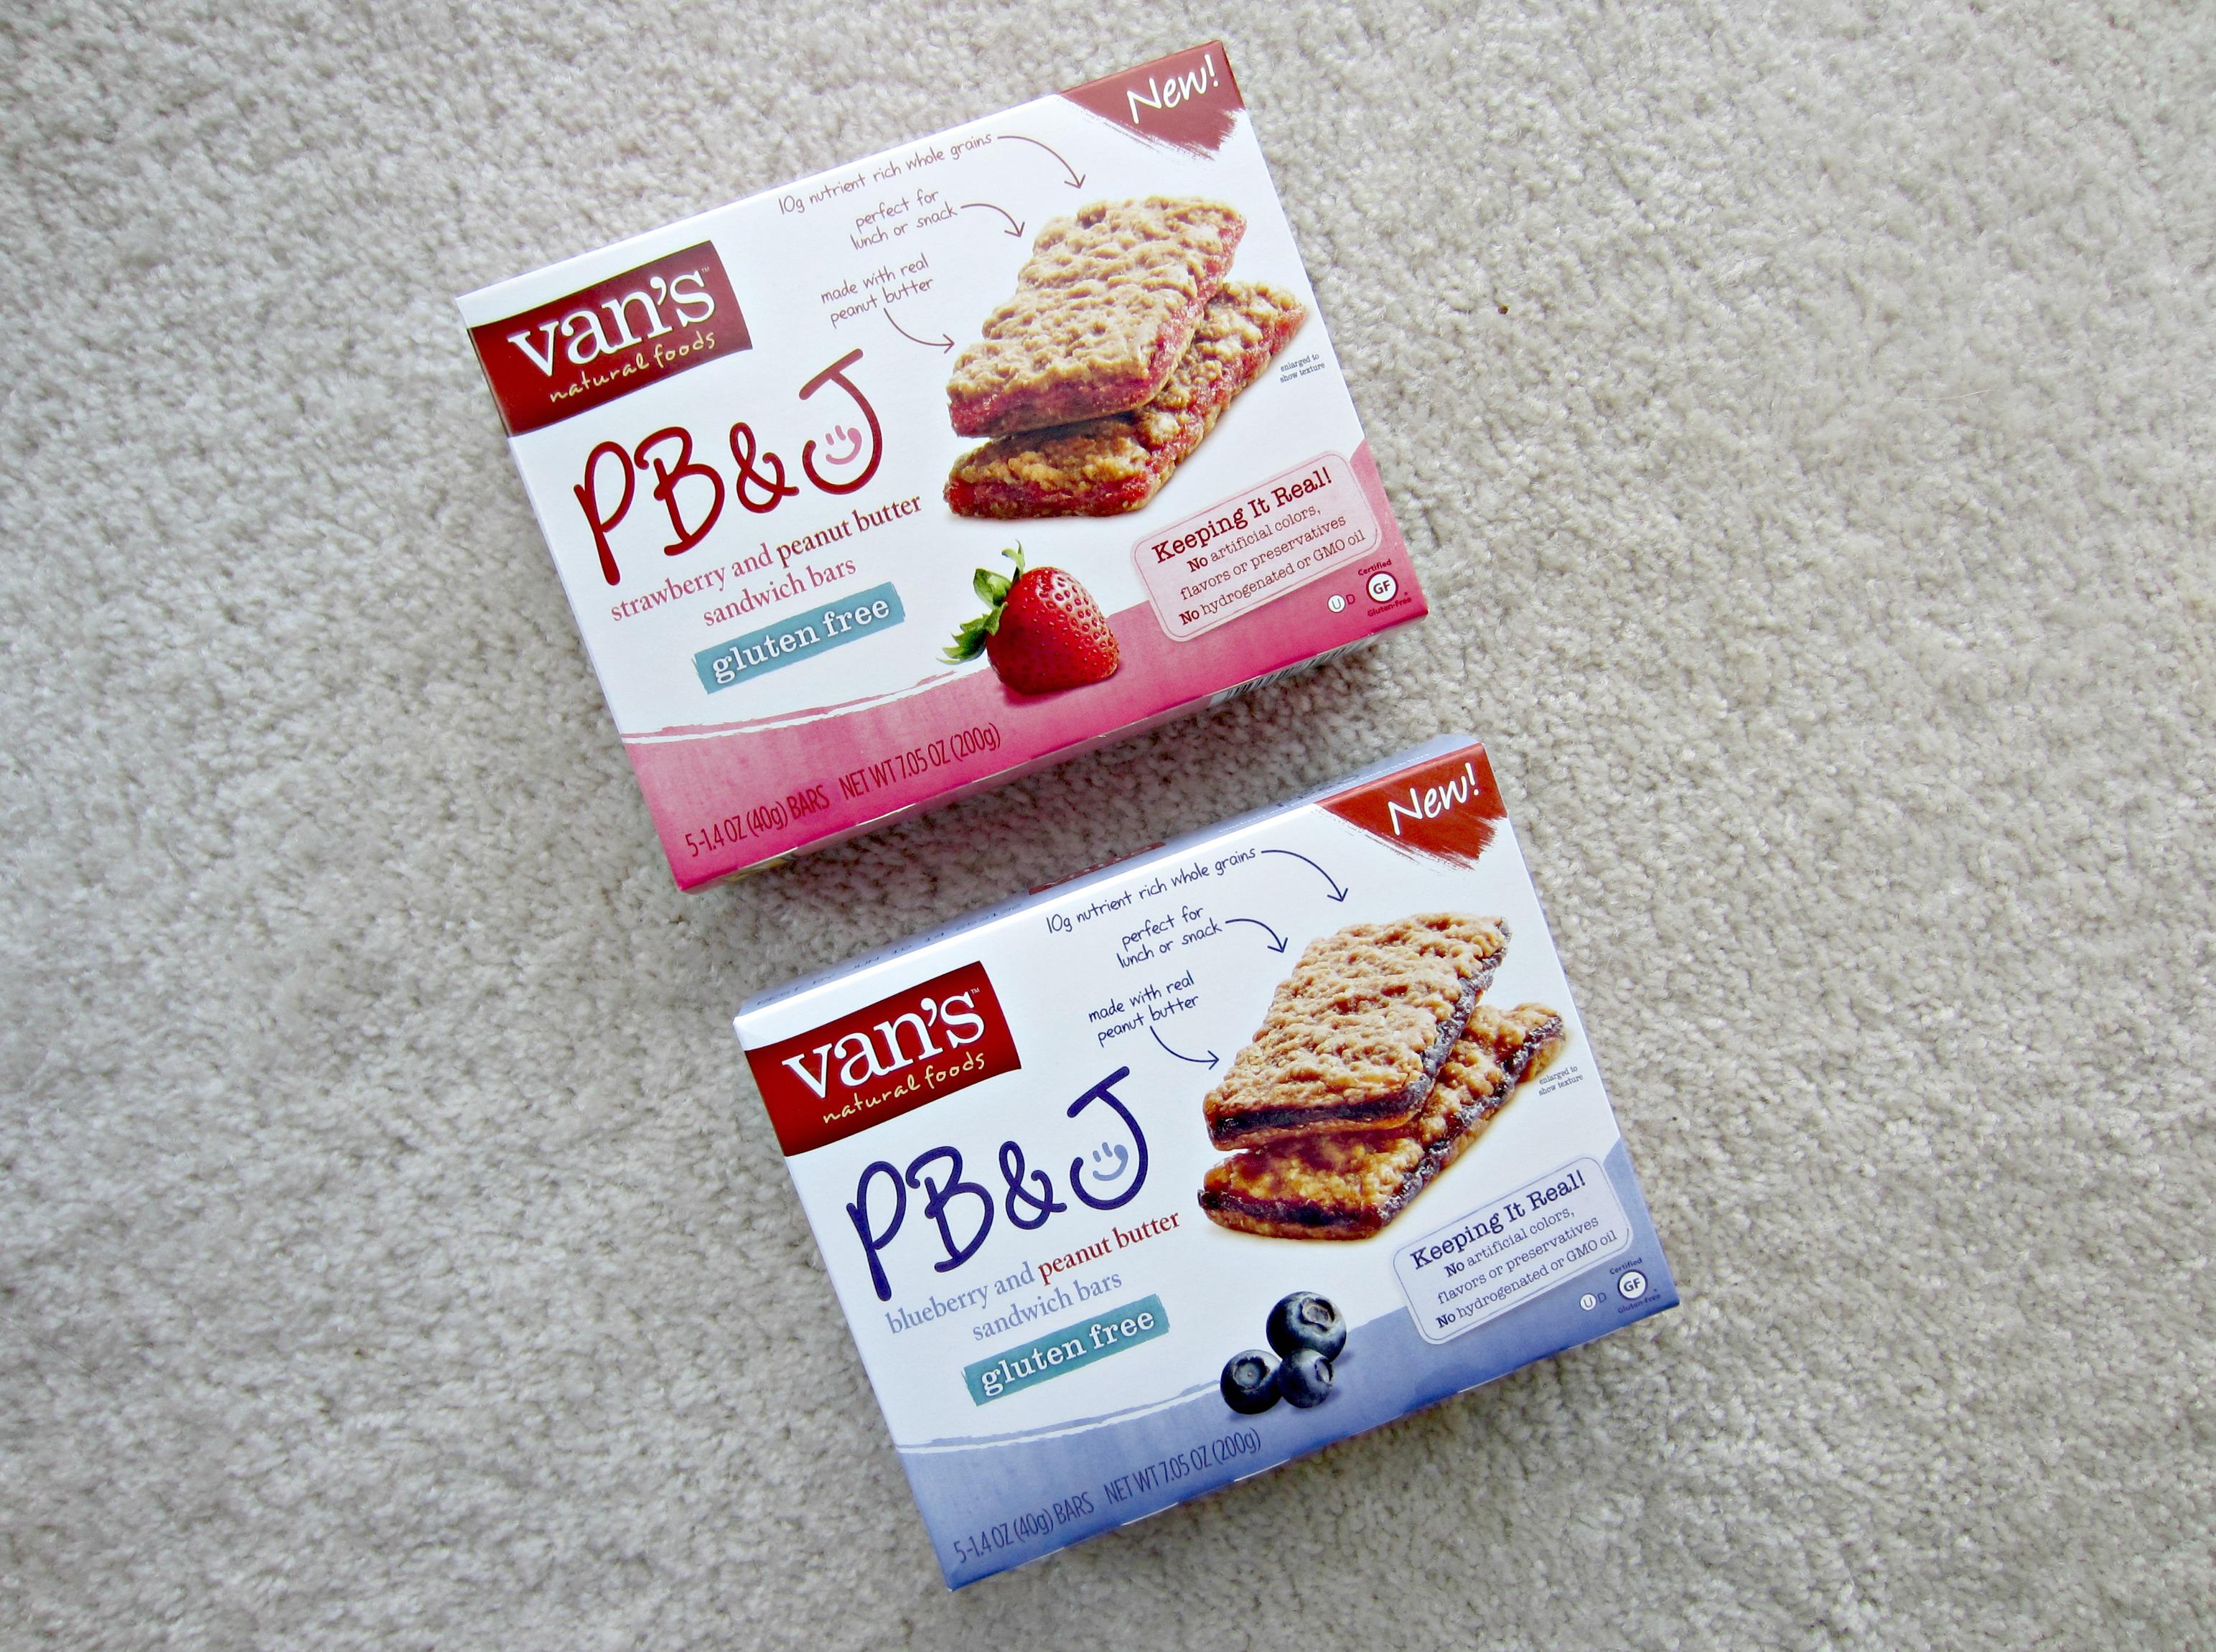 Van's PB&J gluten free sandwich bars